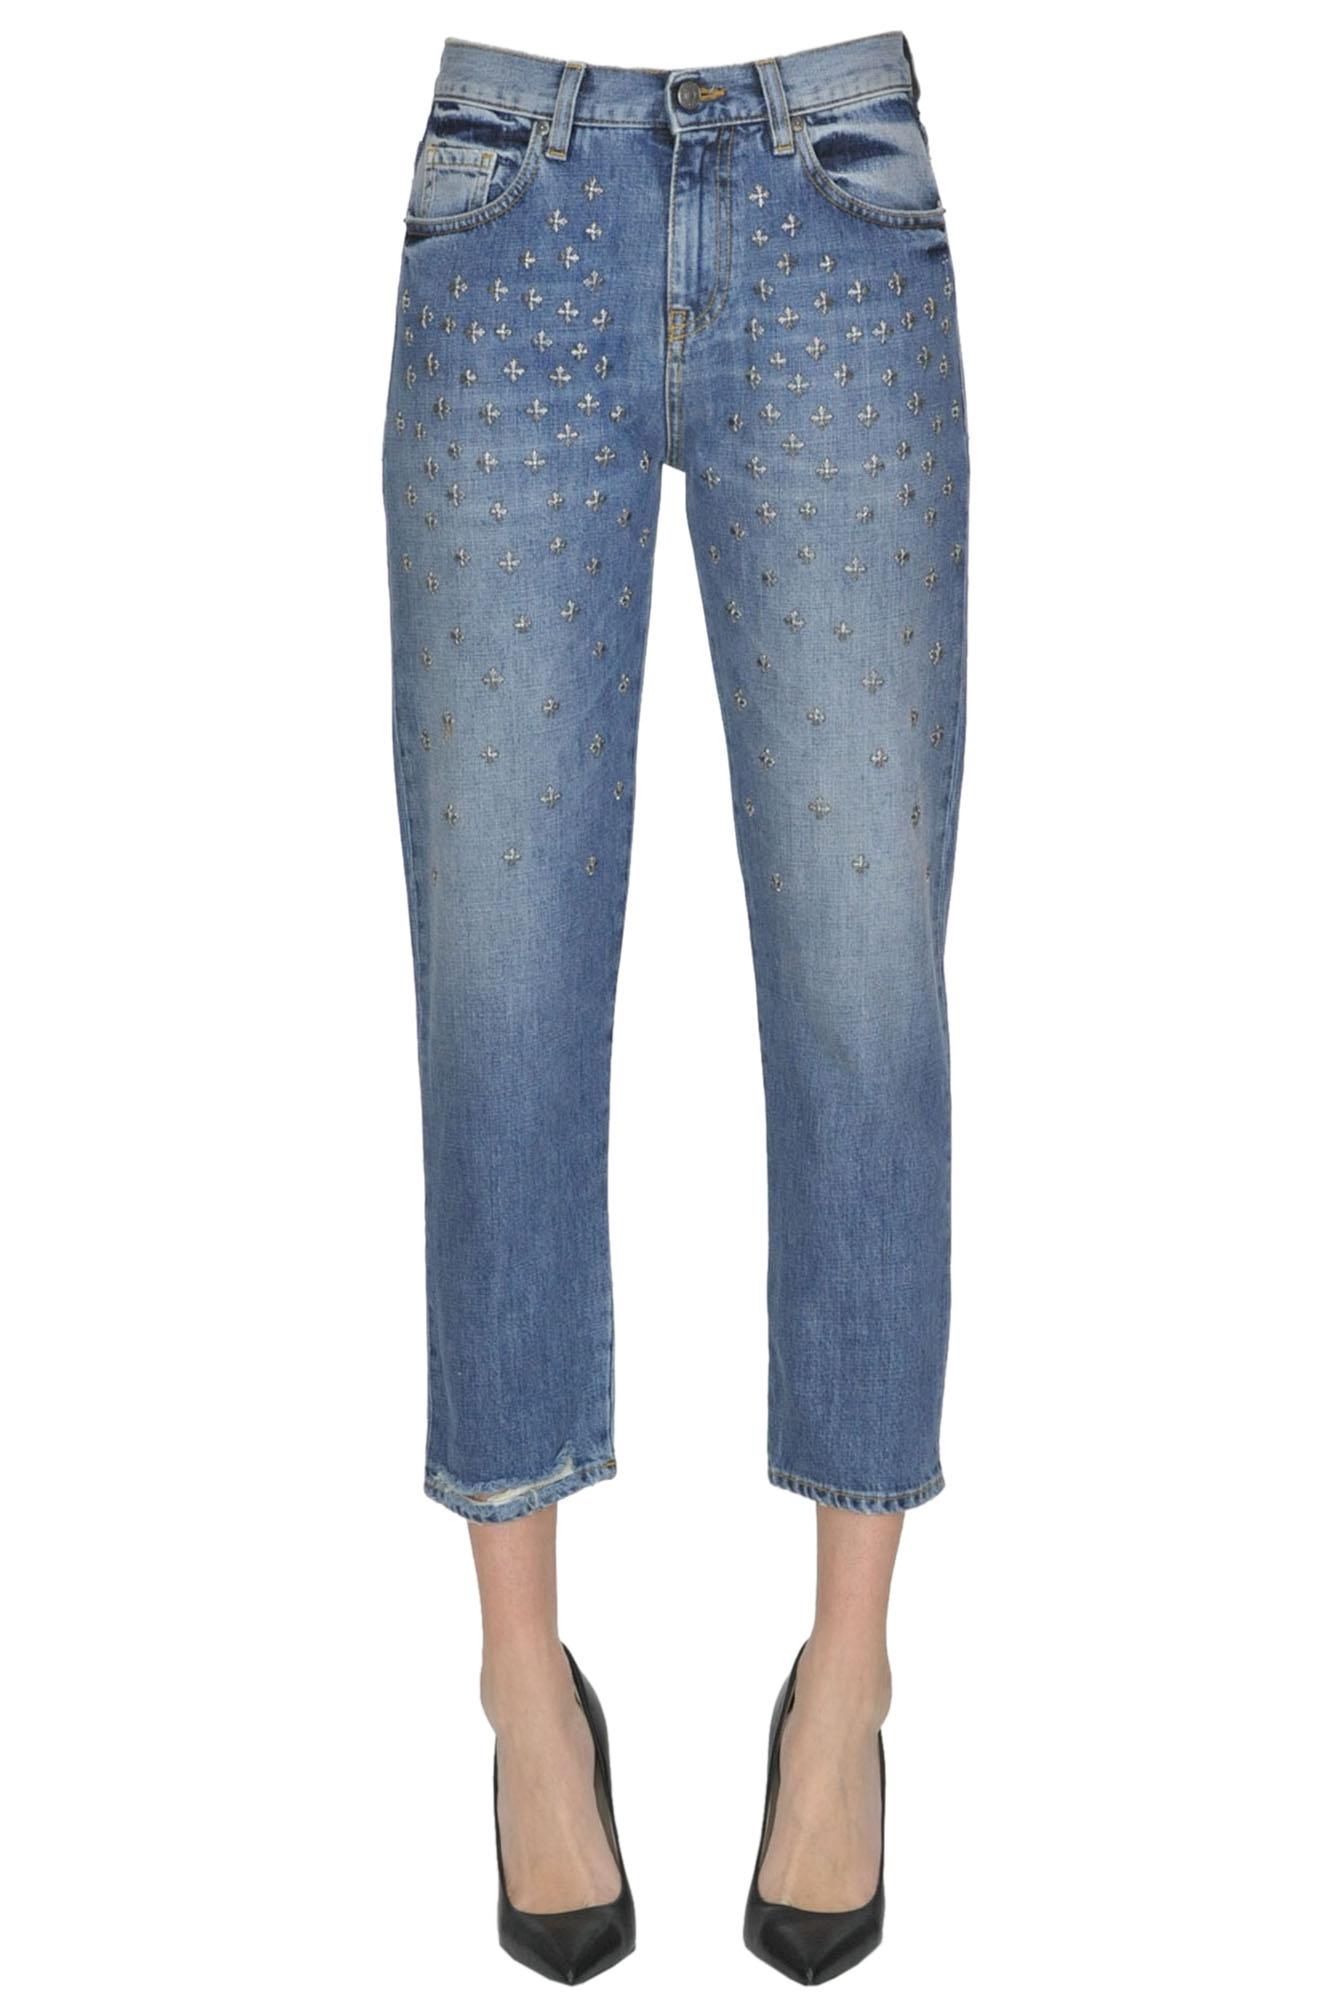 GAELLE PARIS Embellished Cropped Jeans in Light Denim